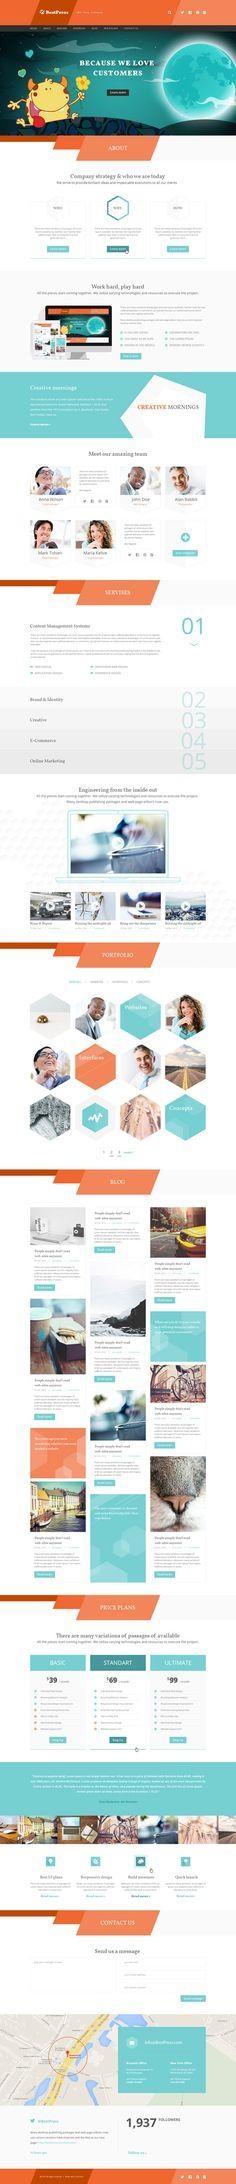 BestPress - Creative Landing Page #psdtemplates #onepagetemplates #businesstemplates #websitetemplates